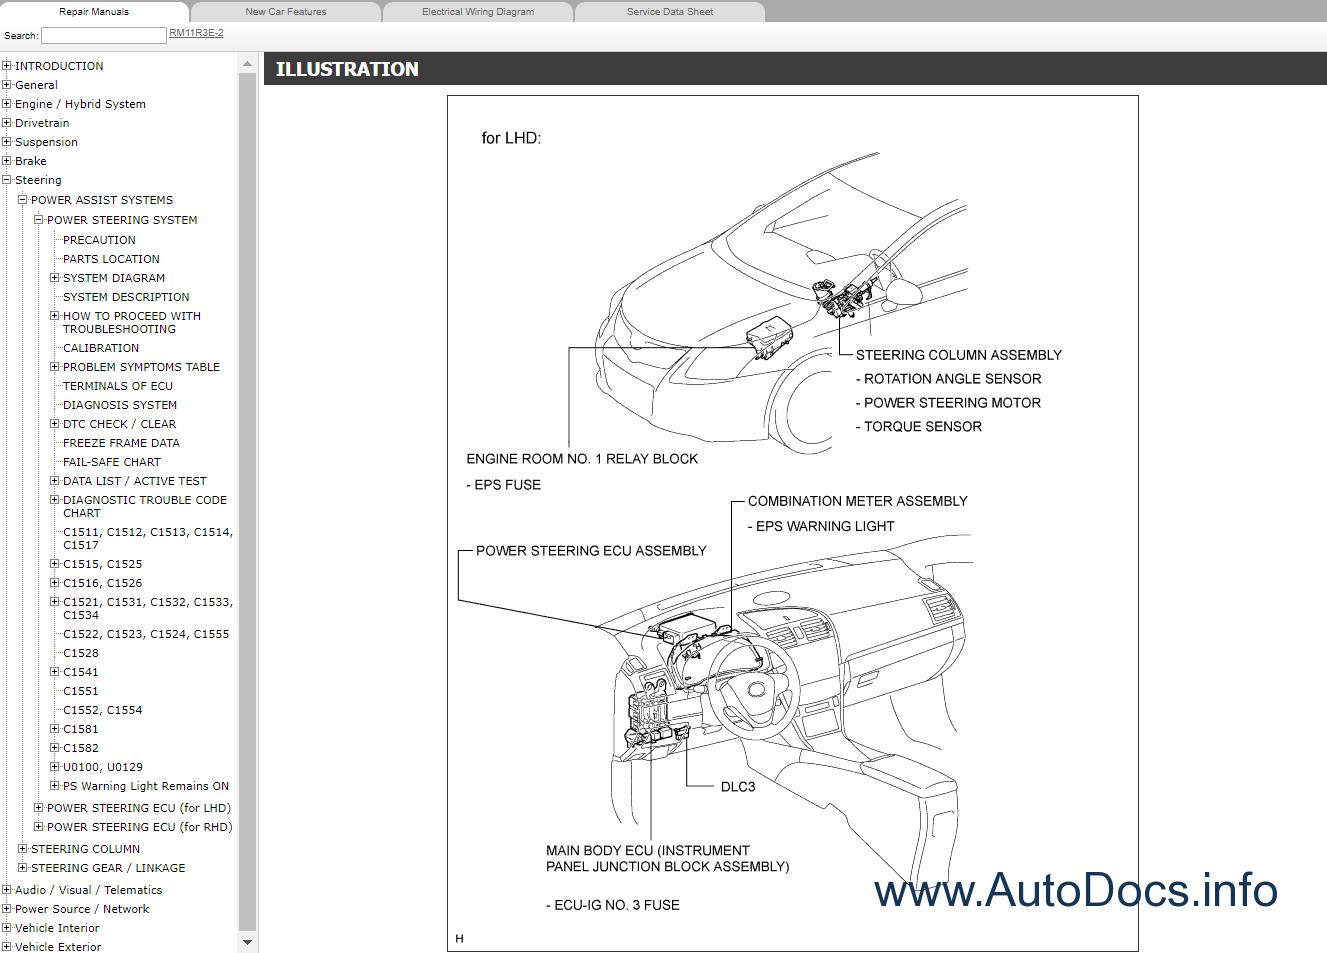 2008 Toyota Corolla Matrix Electrical Wiring Diagram Service